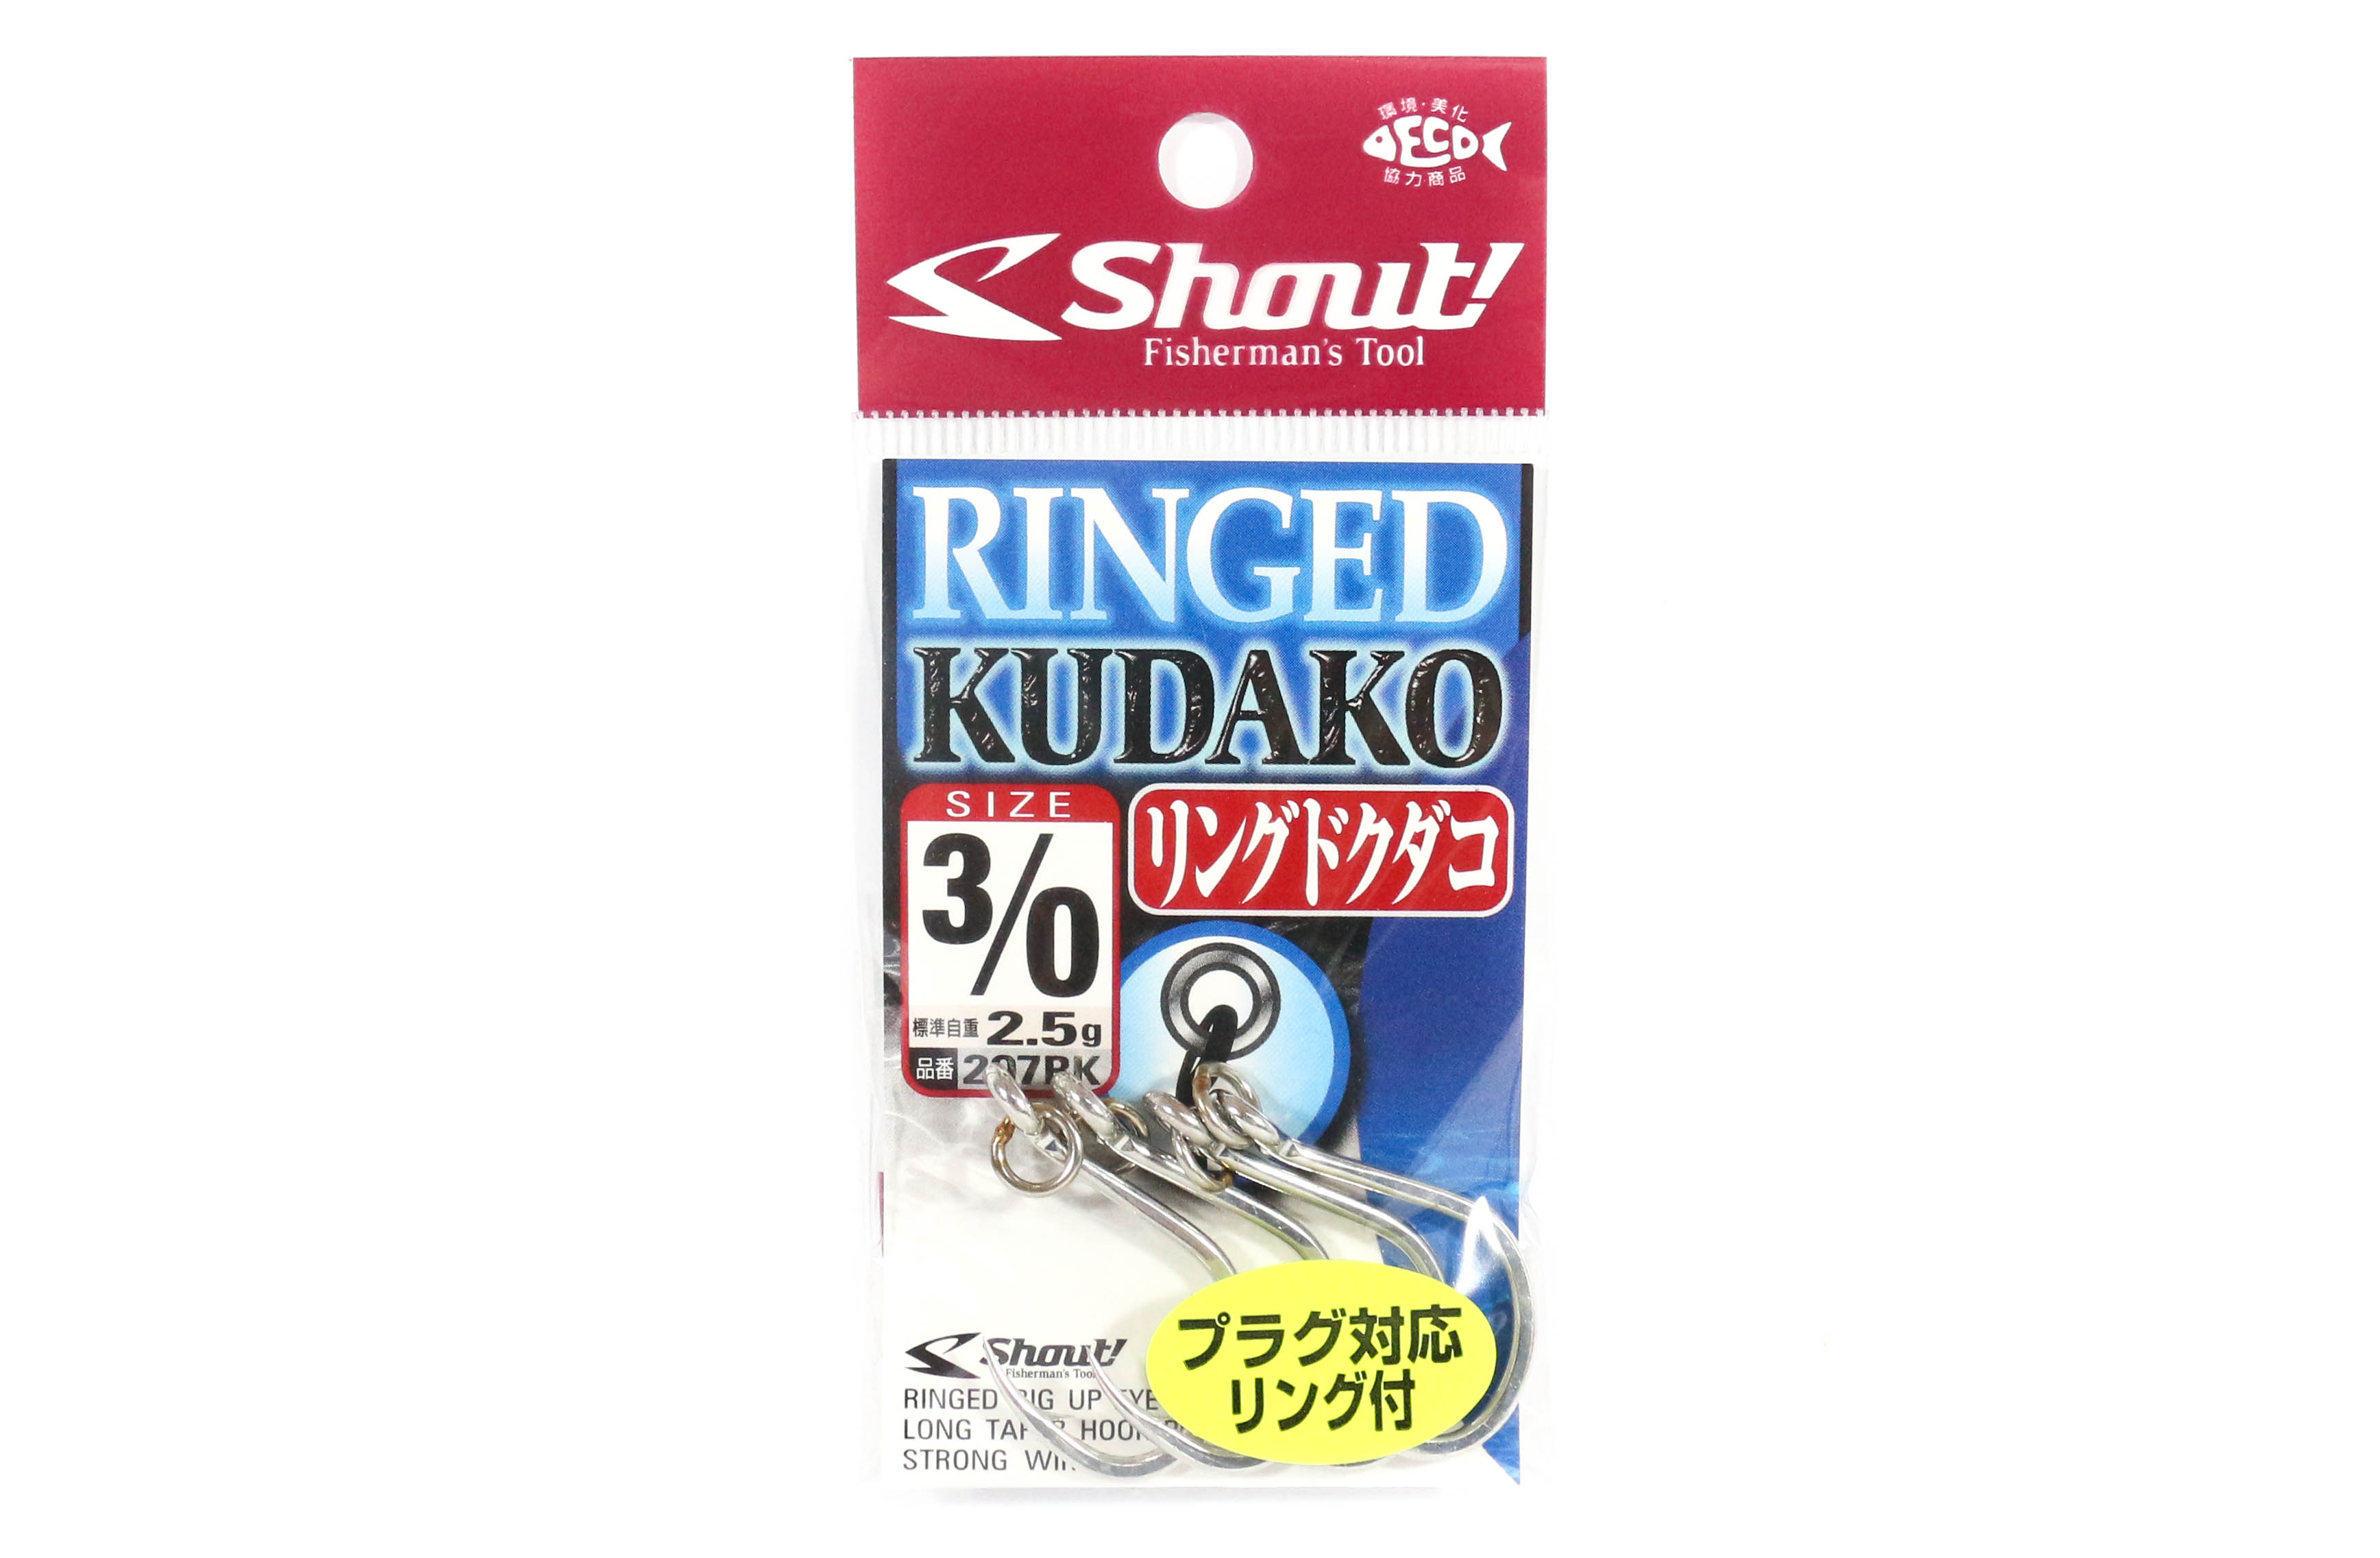 Shout 207-RK Ringed Kudako Power Jigging Single Hook Silver Size 3/0 (7841)